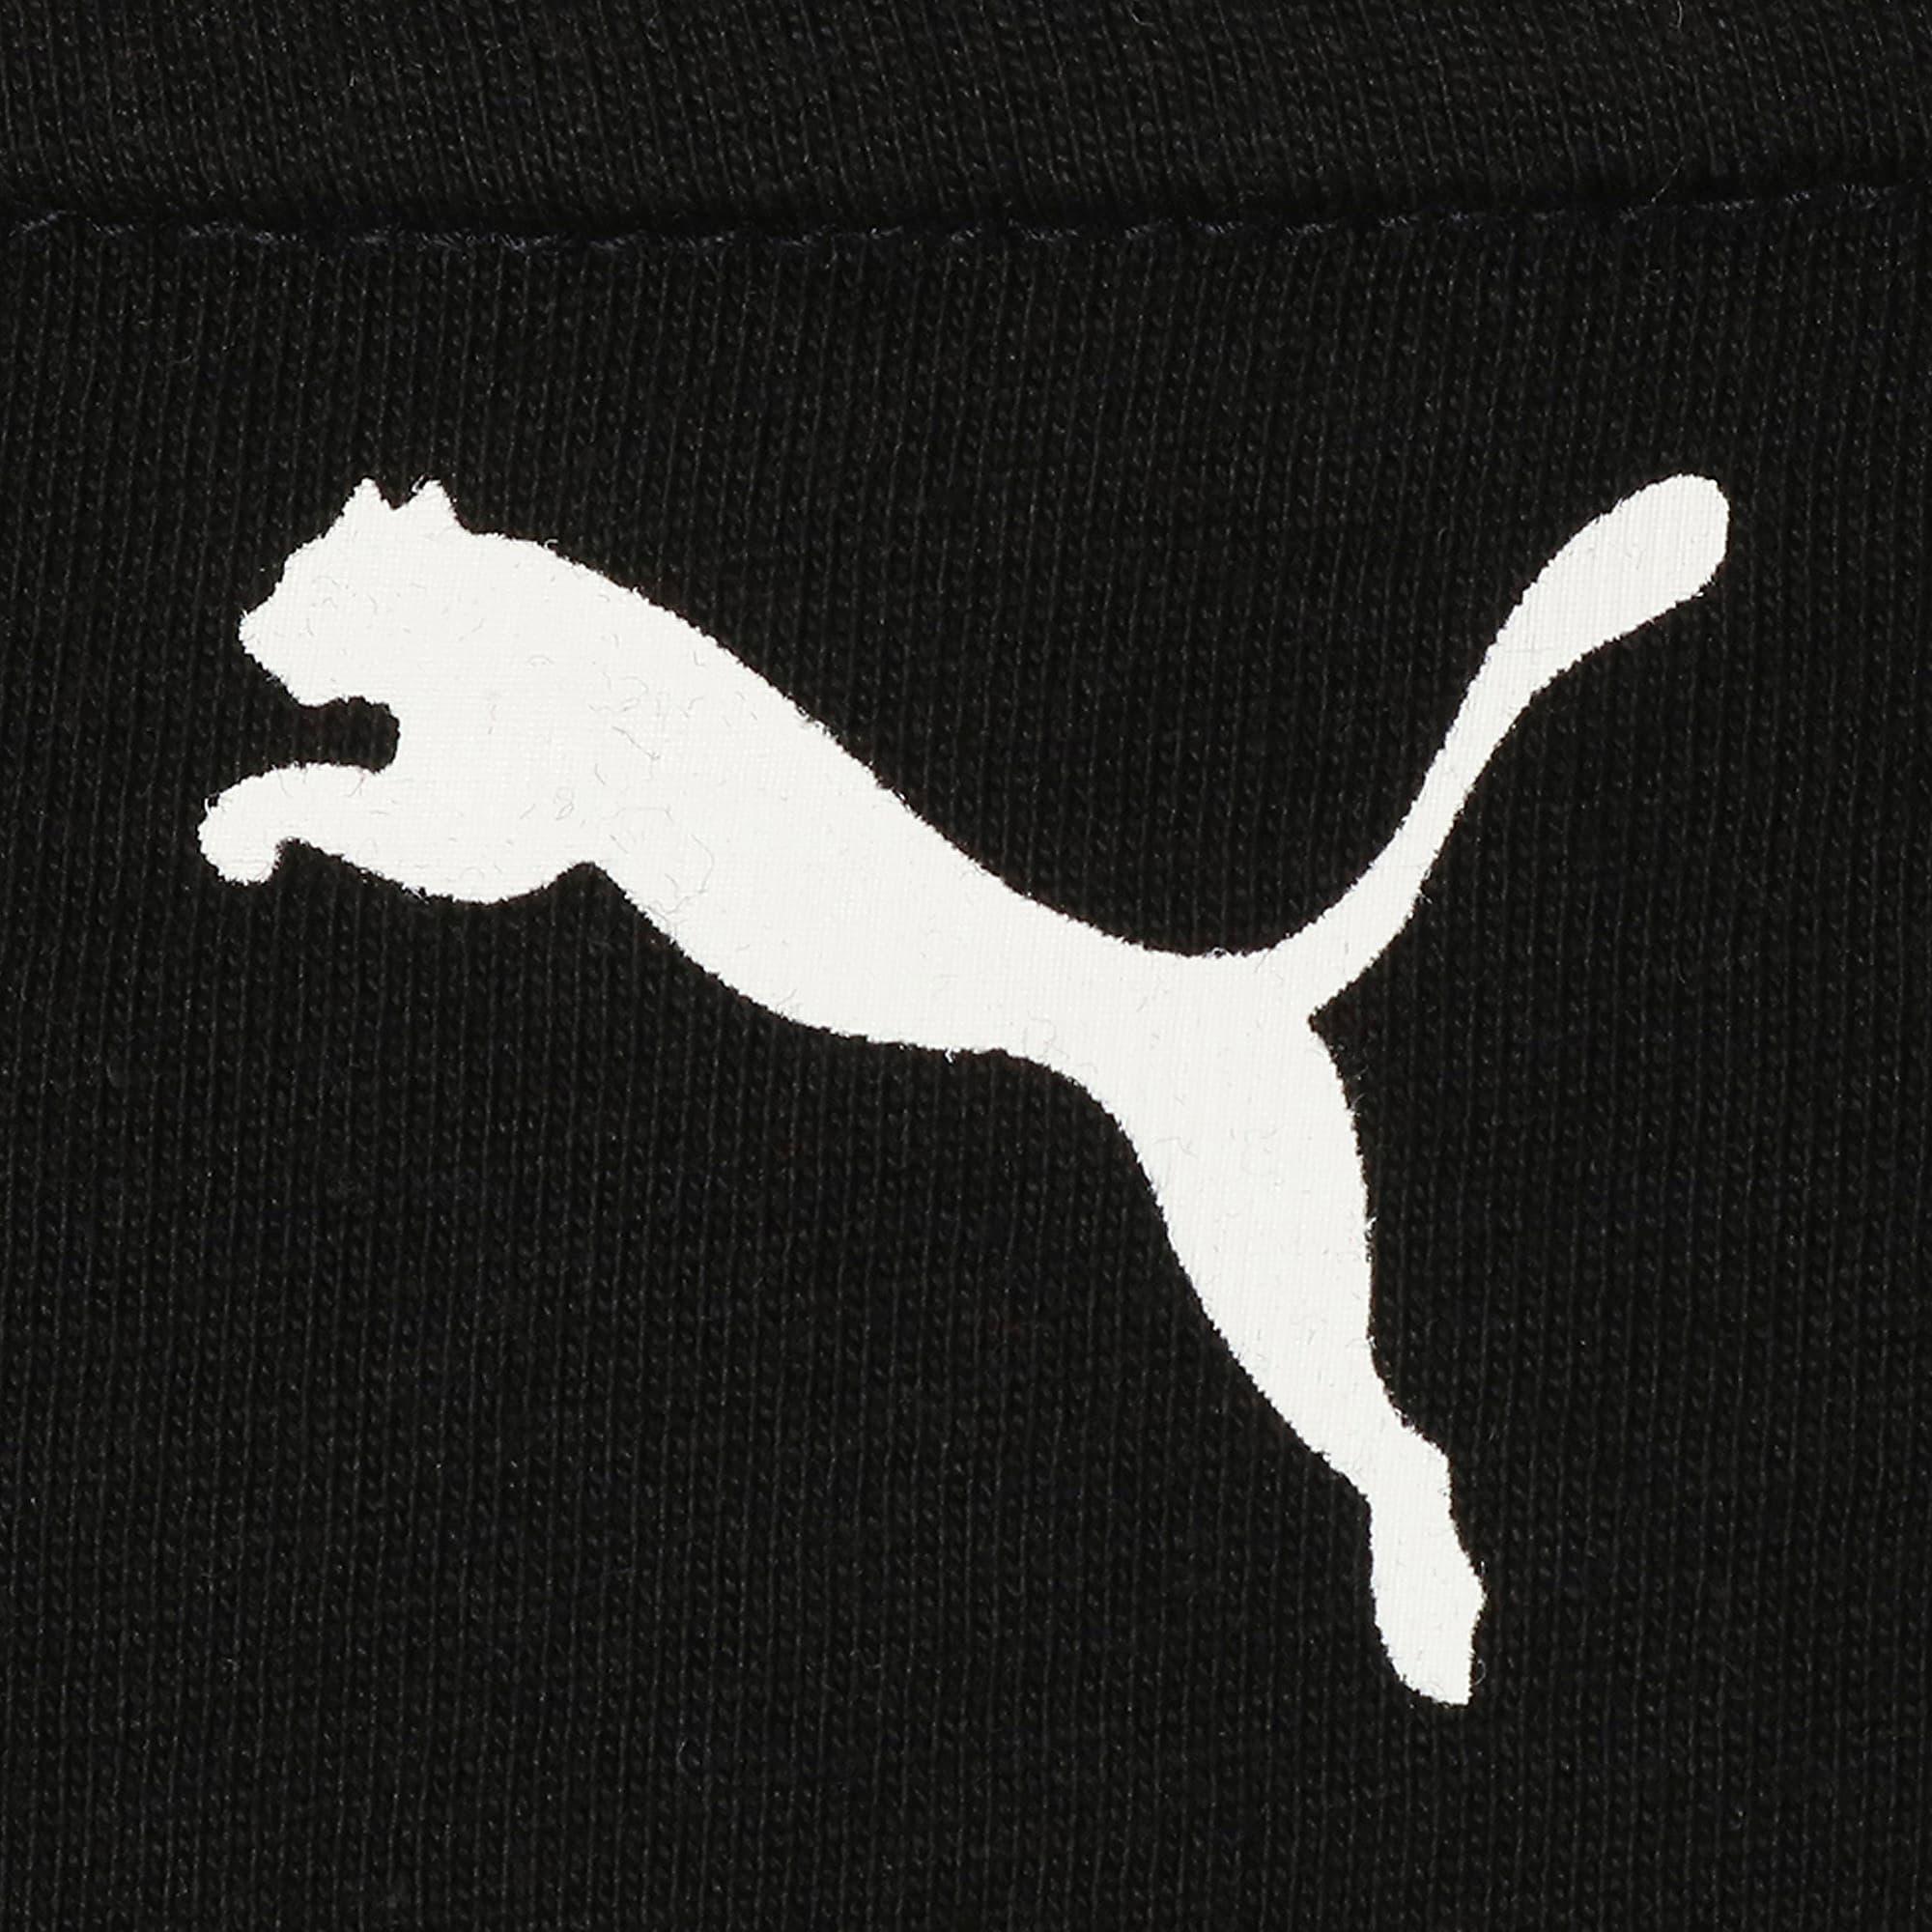 Thumbnail 7 of キッズ ALPHA SS トレンド Tシャツ 半袖, Puma Black, medium-JPN